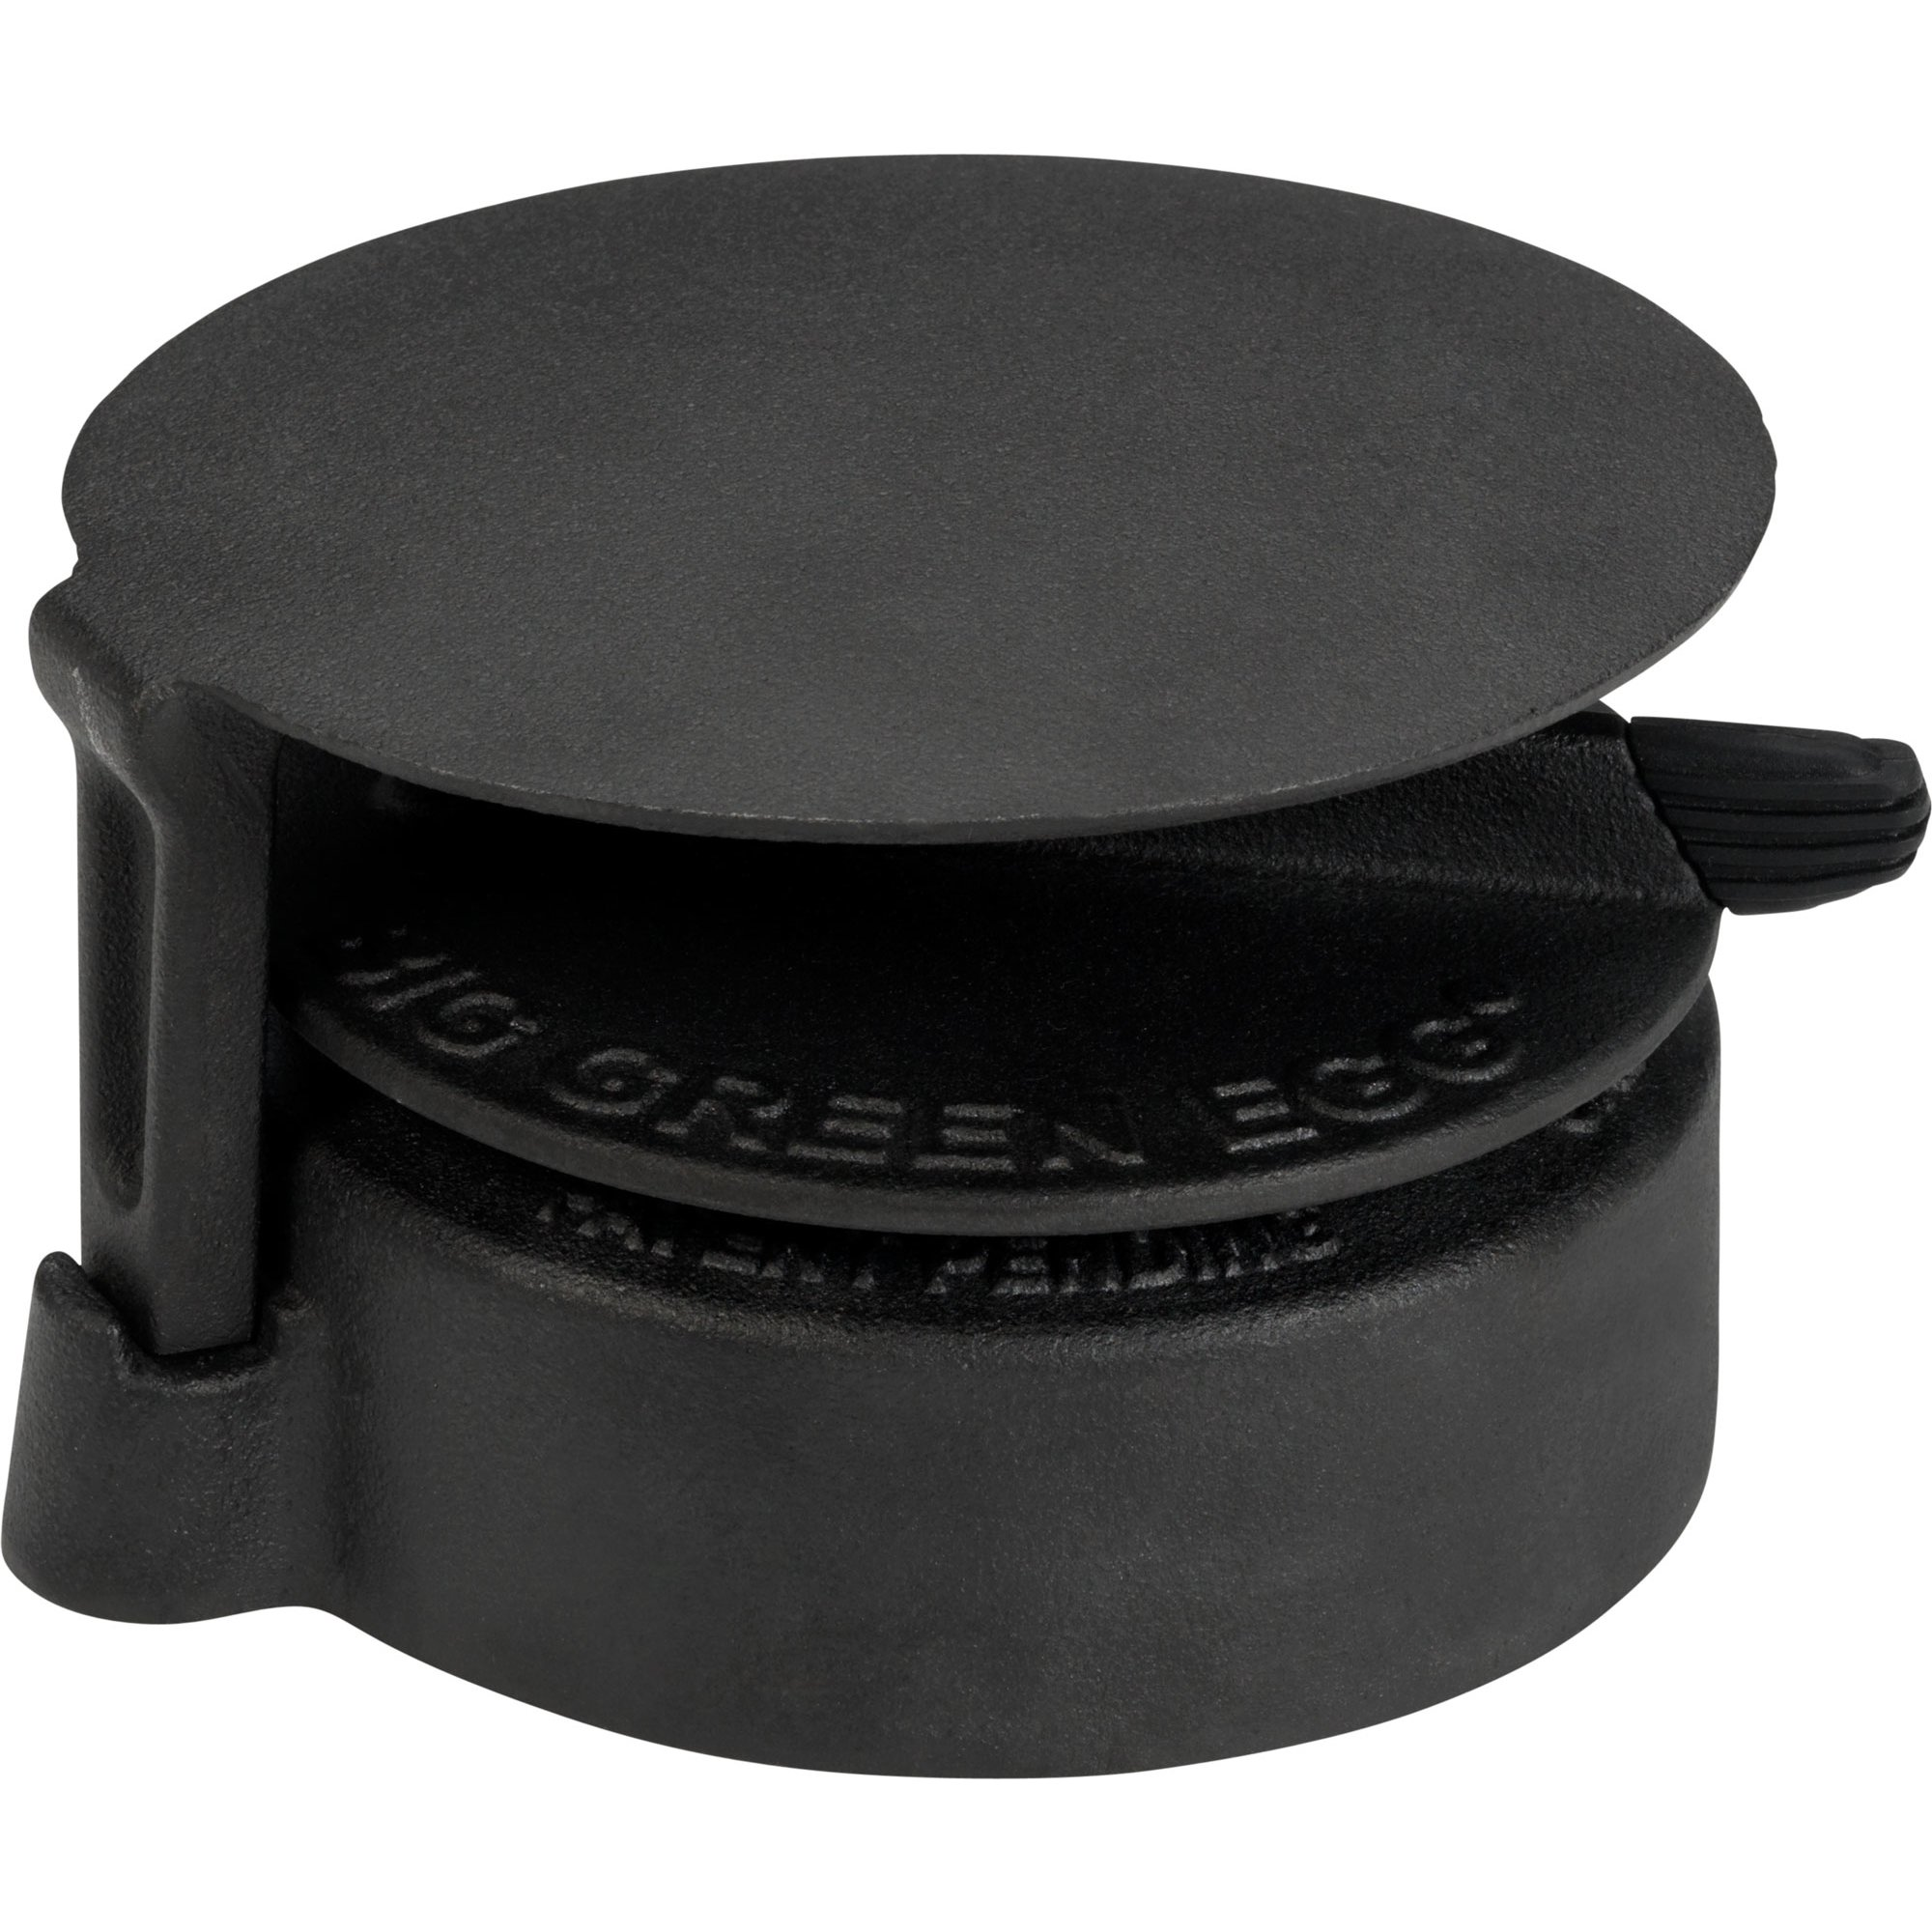 Big Green Egg rEGGulator regnlock small / MiniMax